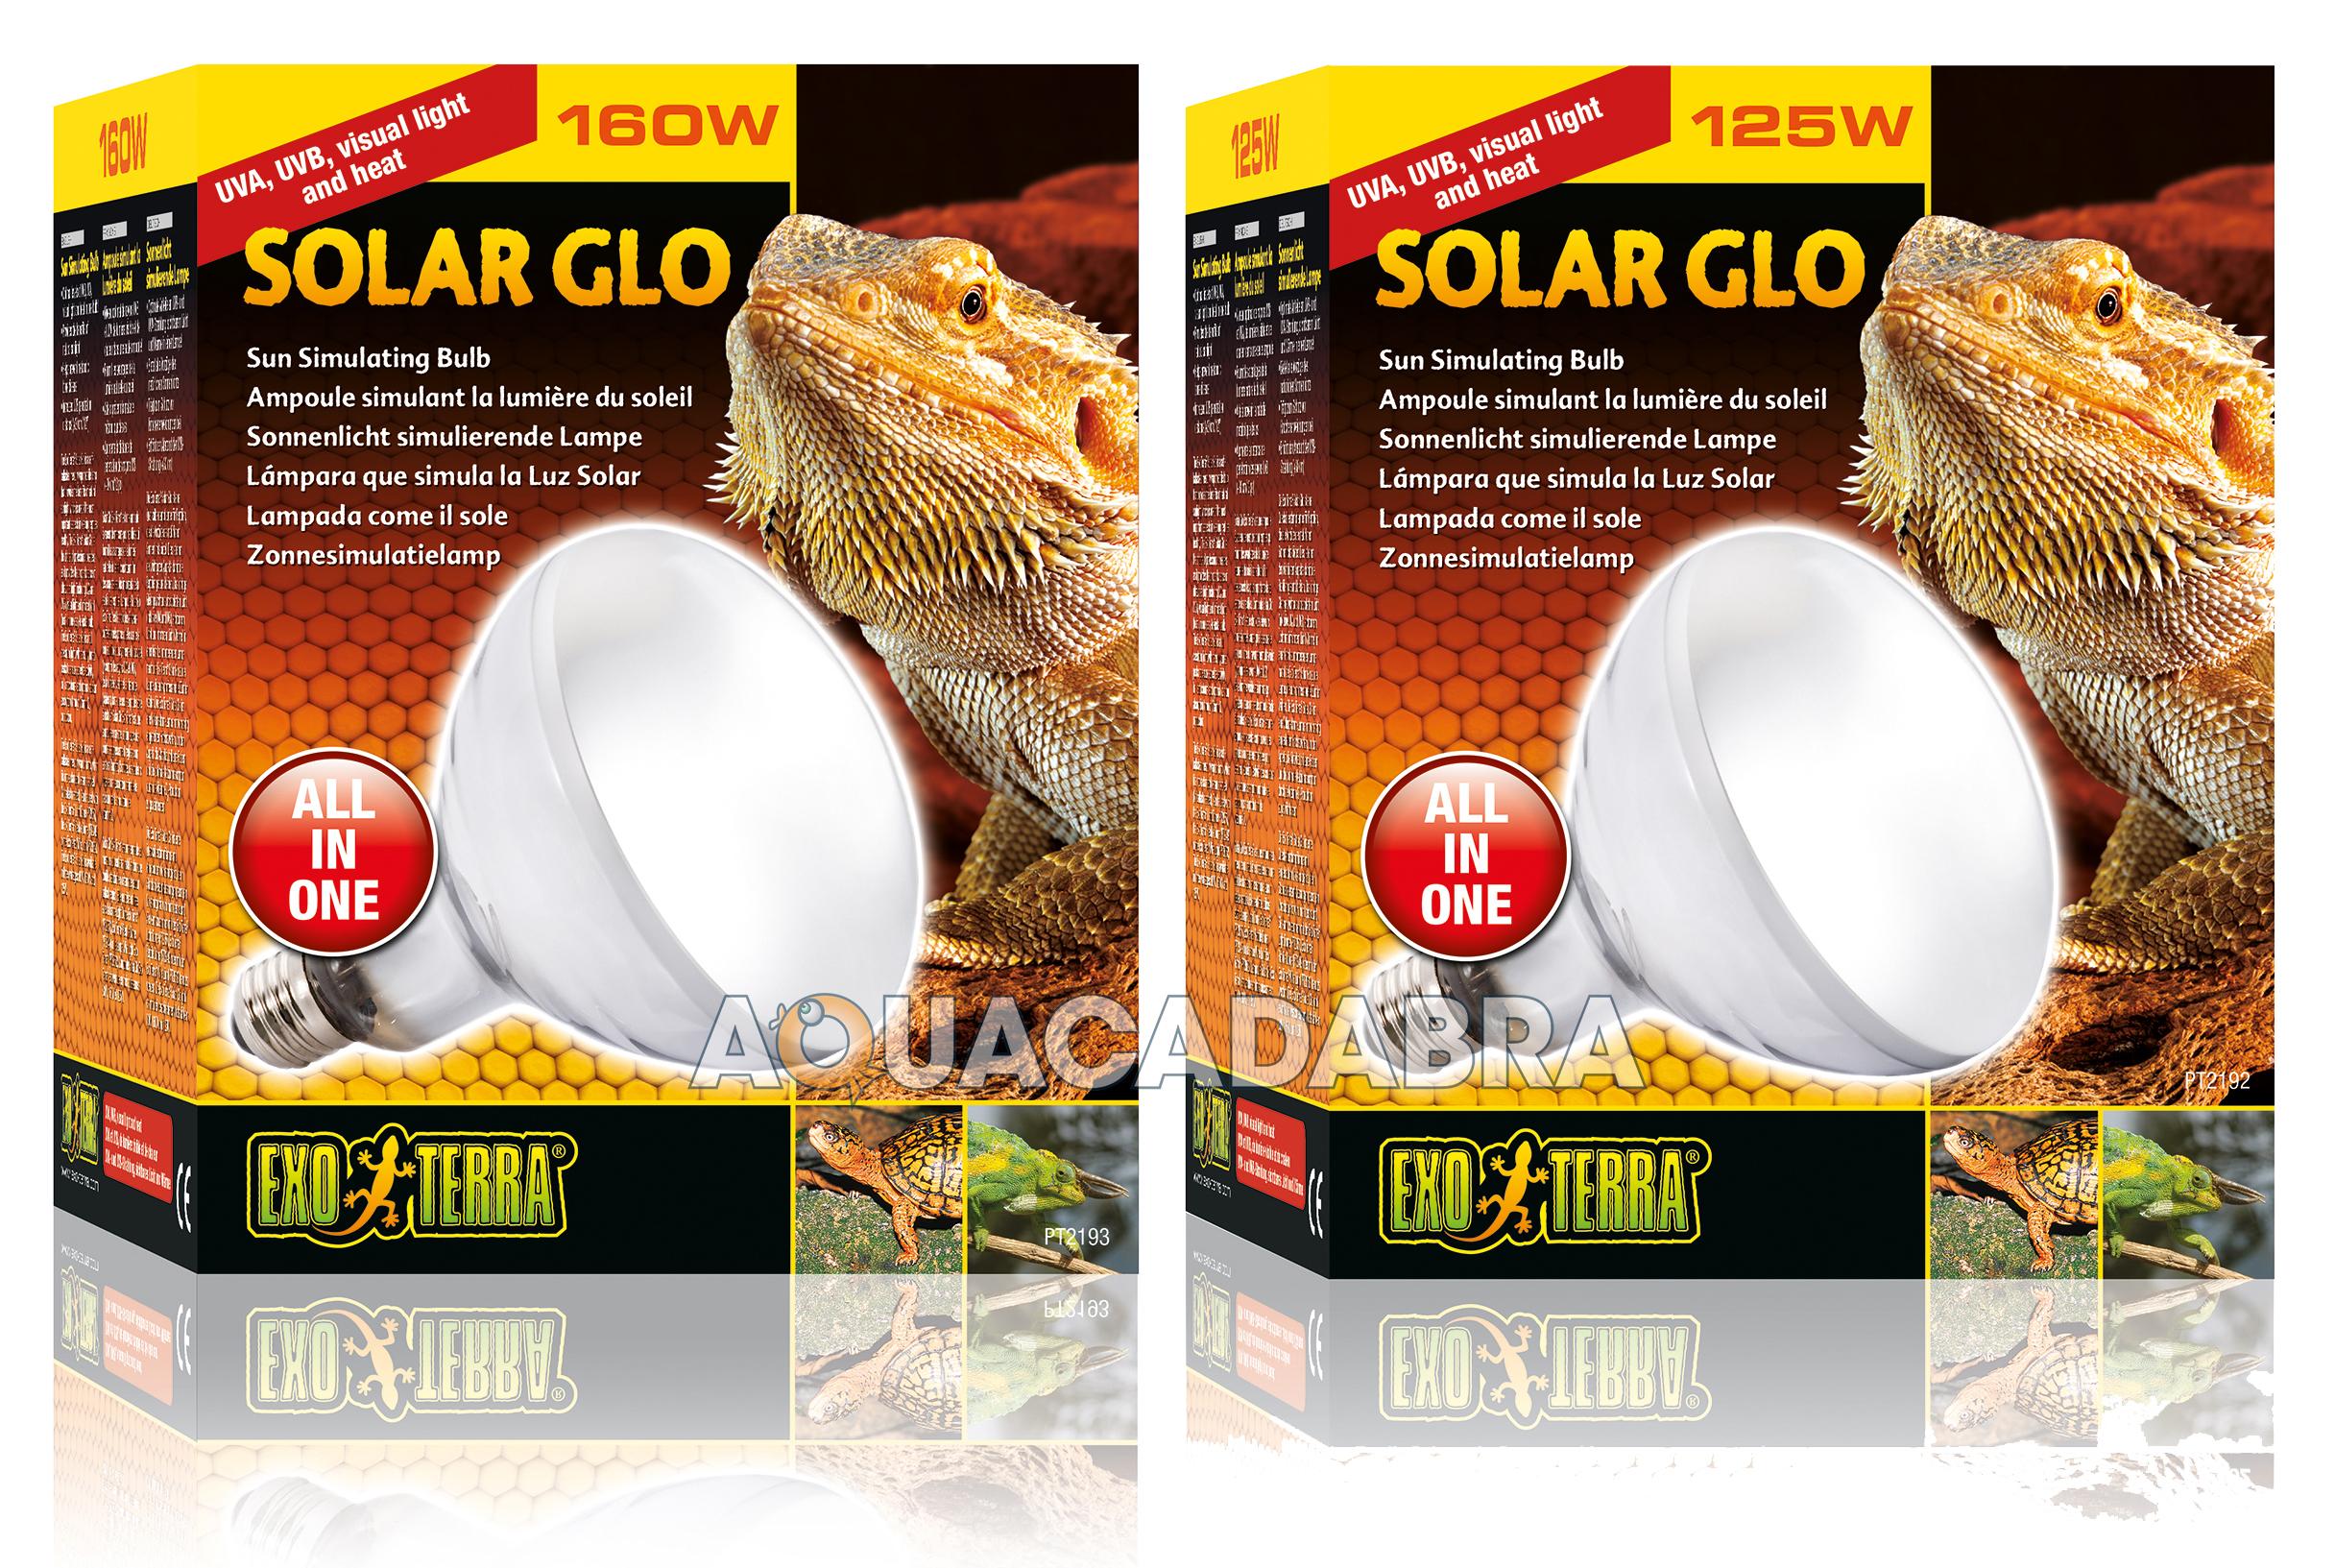 exo terra solar glo bulb 80w 125w 160w reptile vivarium lizard heat lamp basking ebay. Black Bedroom Furniture Sets. Home Design Ideas